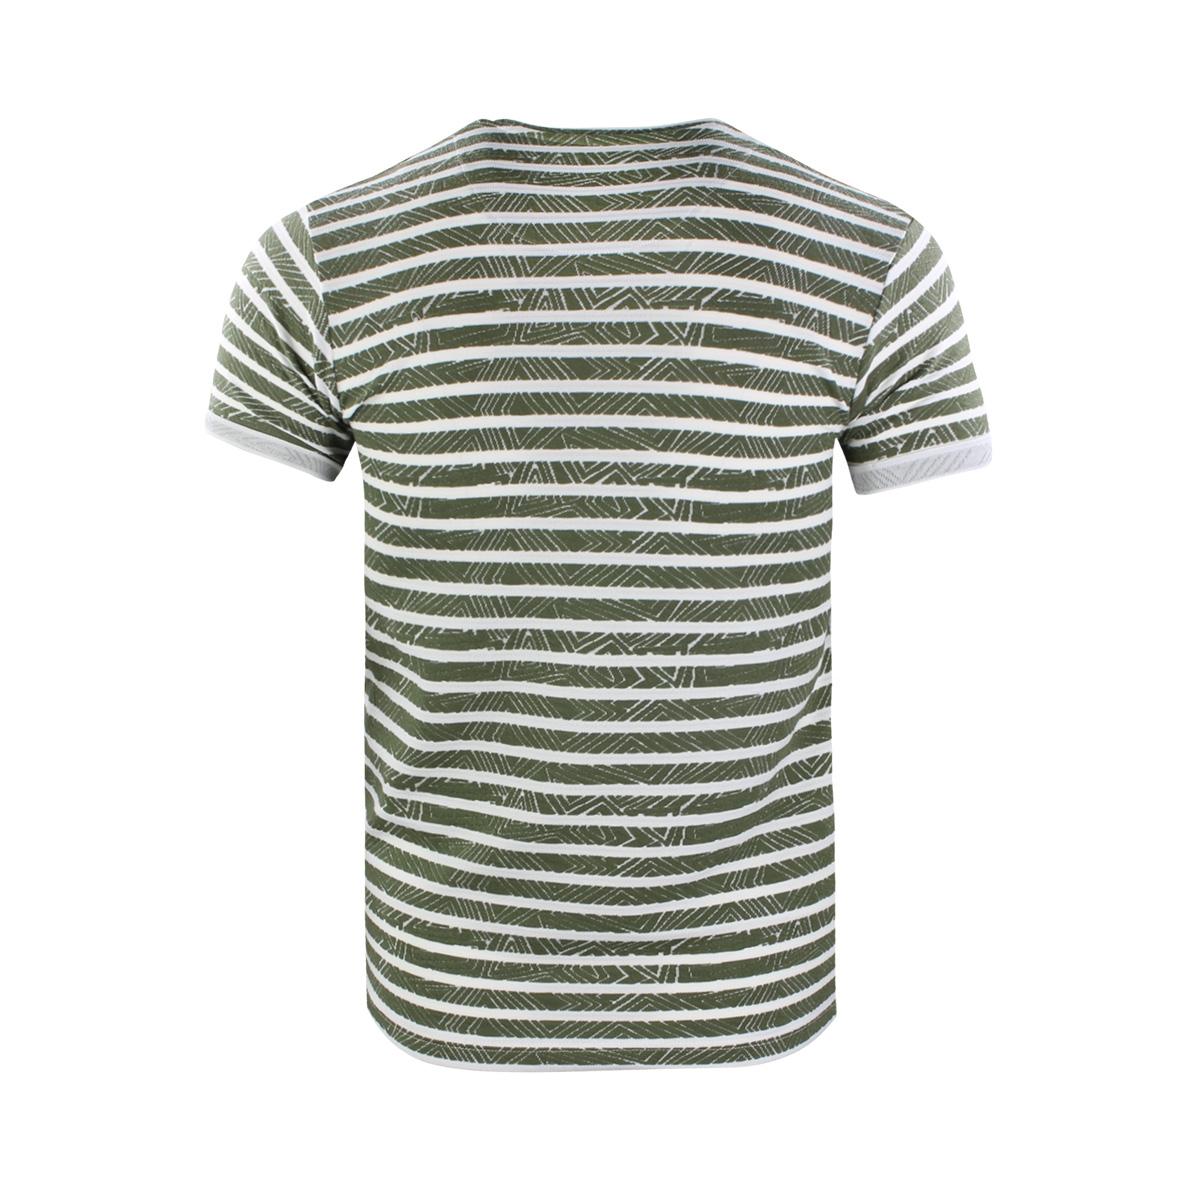 t shirt 15180 gabbiano t-shirt olive green